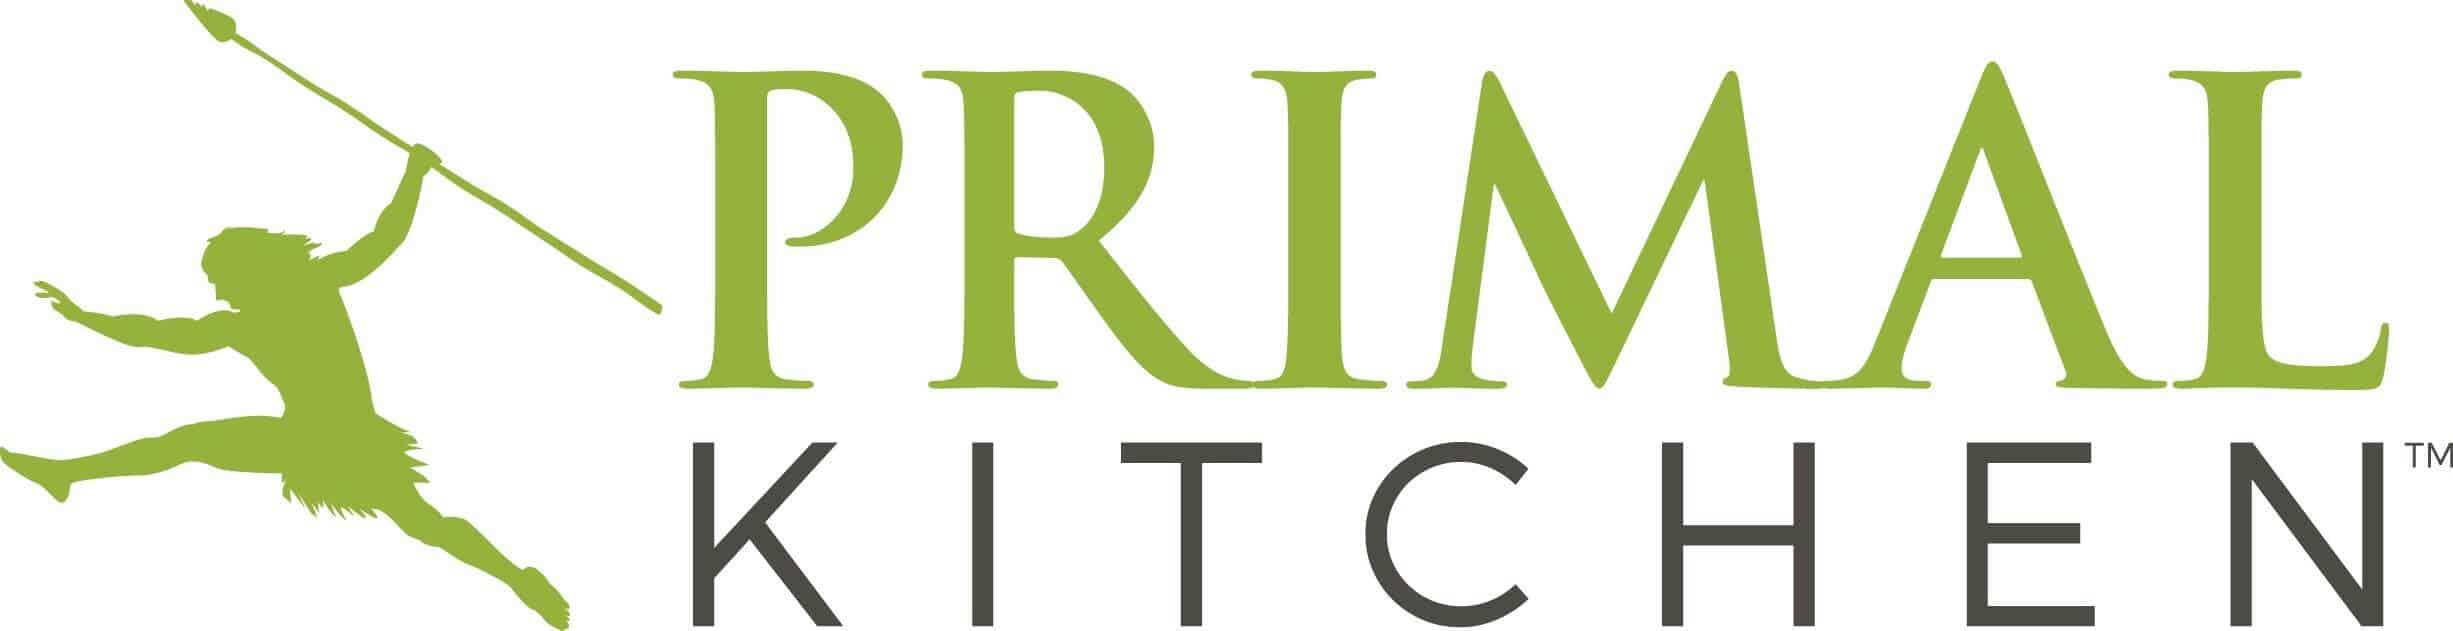 Primal Kitchen Logo